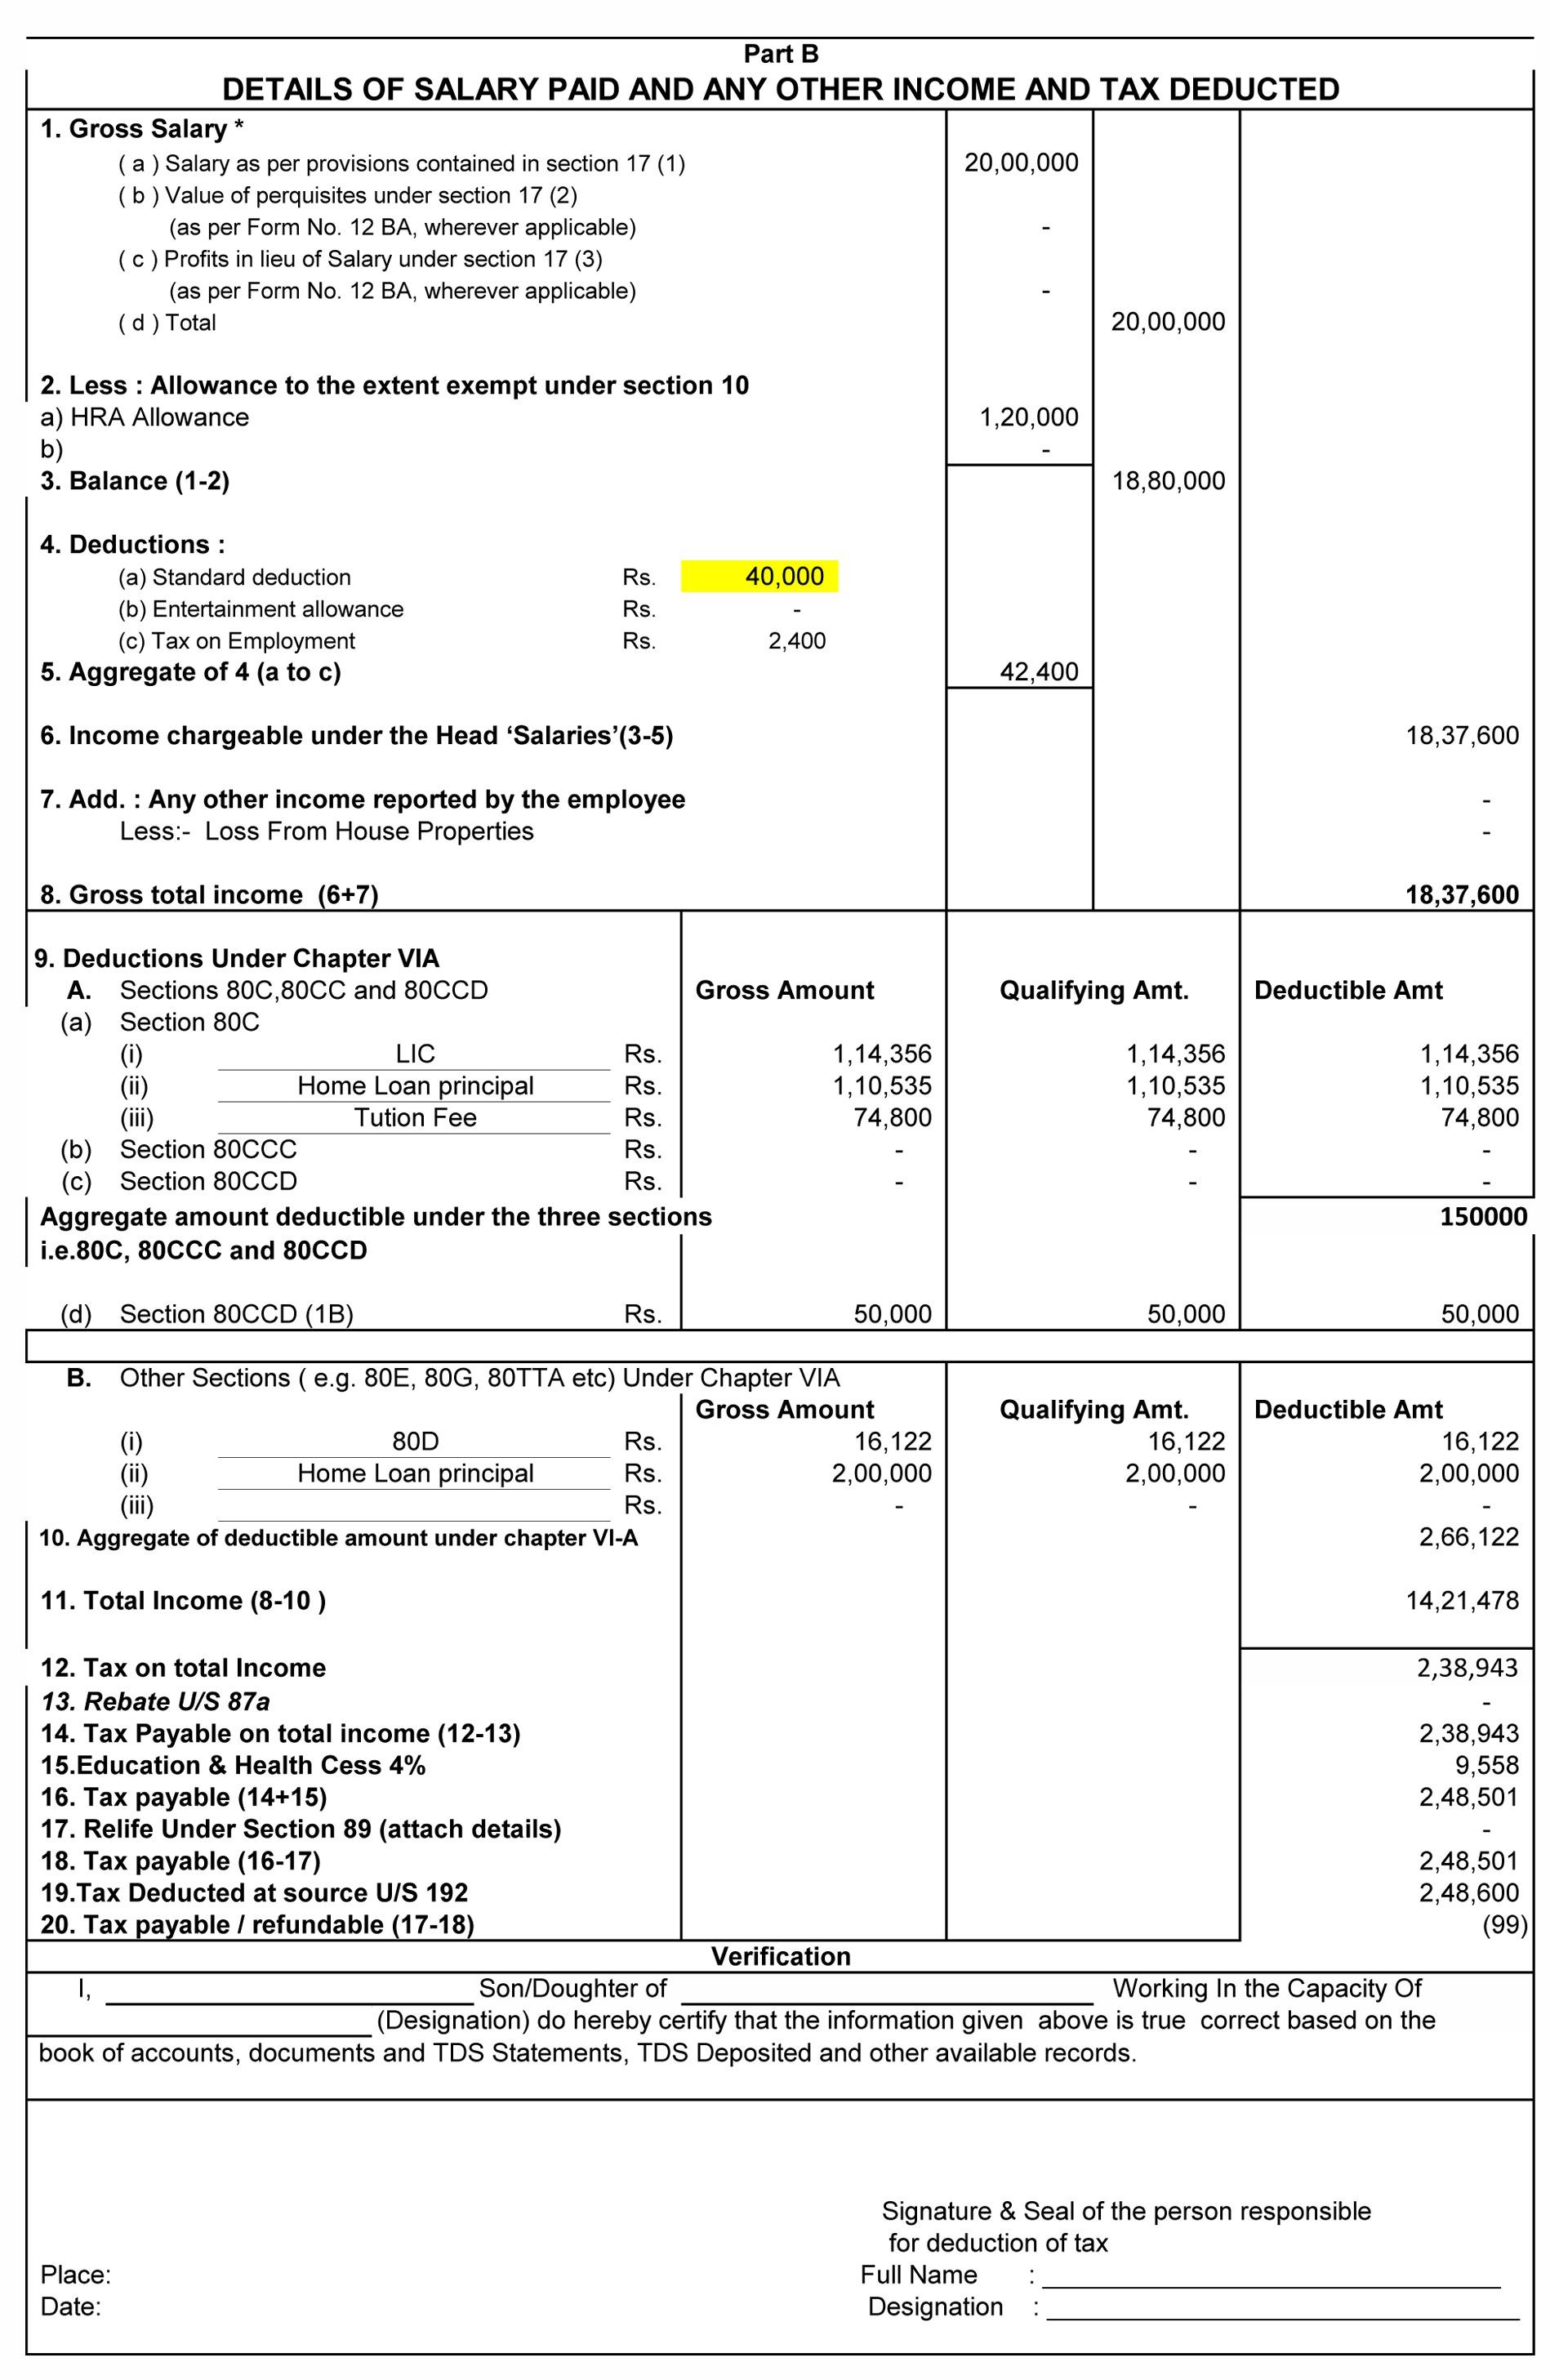 Income tax calculator 2018-19 excel